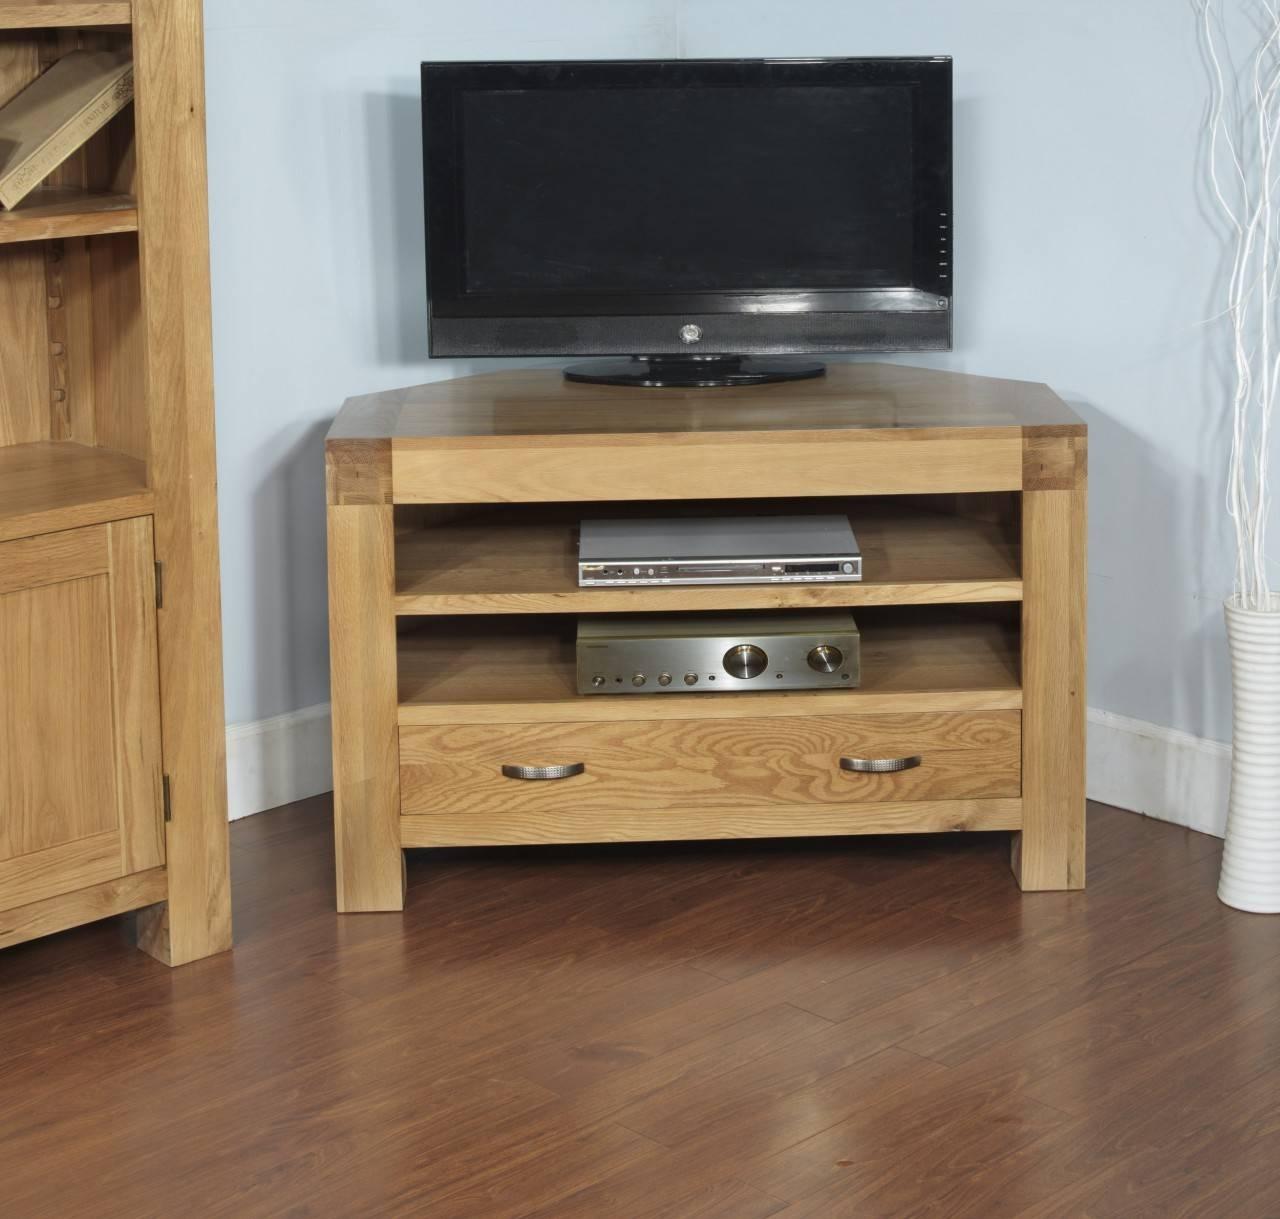 Rivermead Solid Oak Modern Furniture Widescreen Corner Tv Cabinet inside Solid Oak Corner Tv Cabinets (Image 15 of 15)